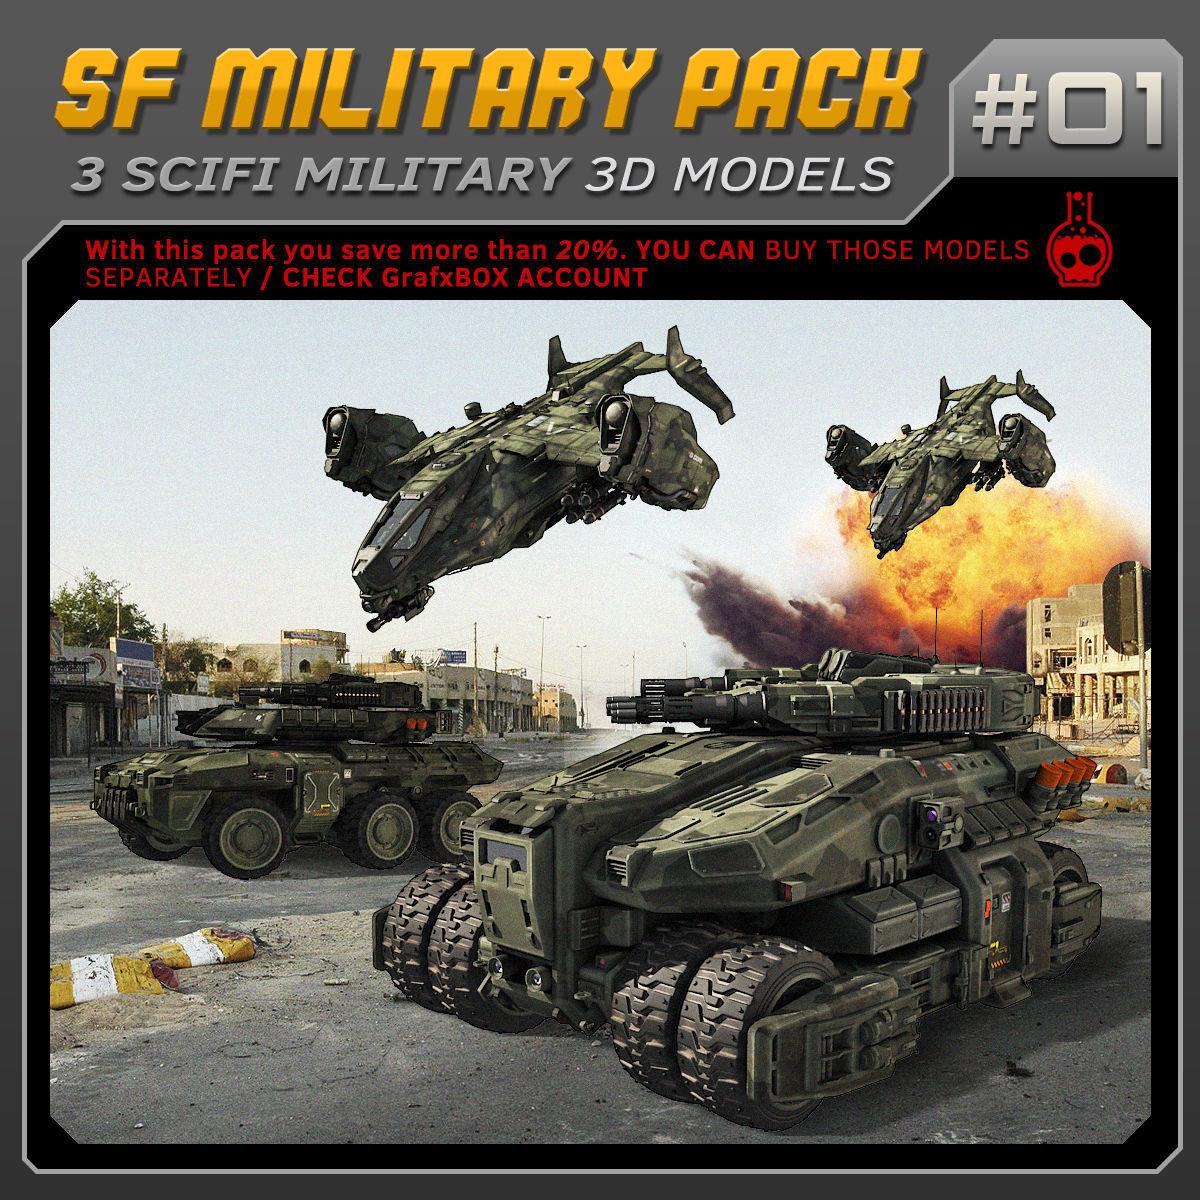 SF Military Pack 01